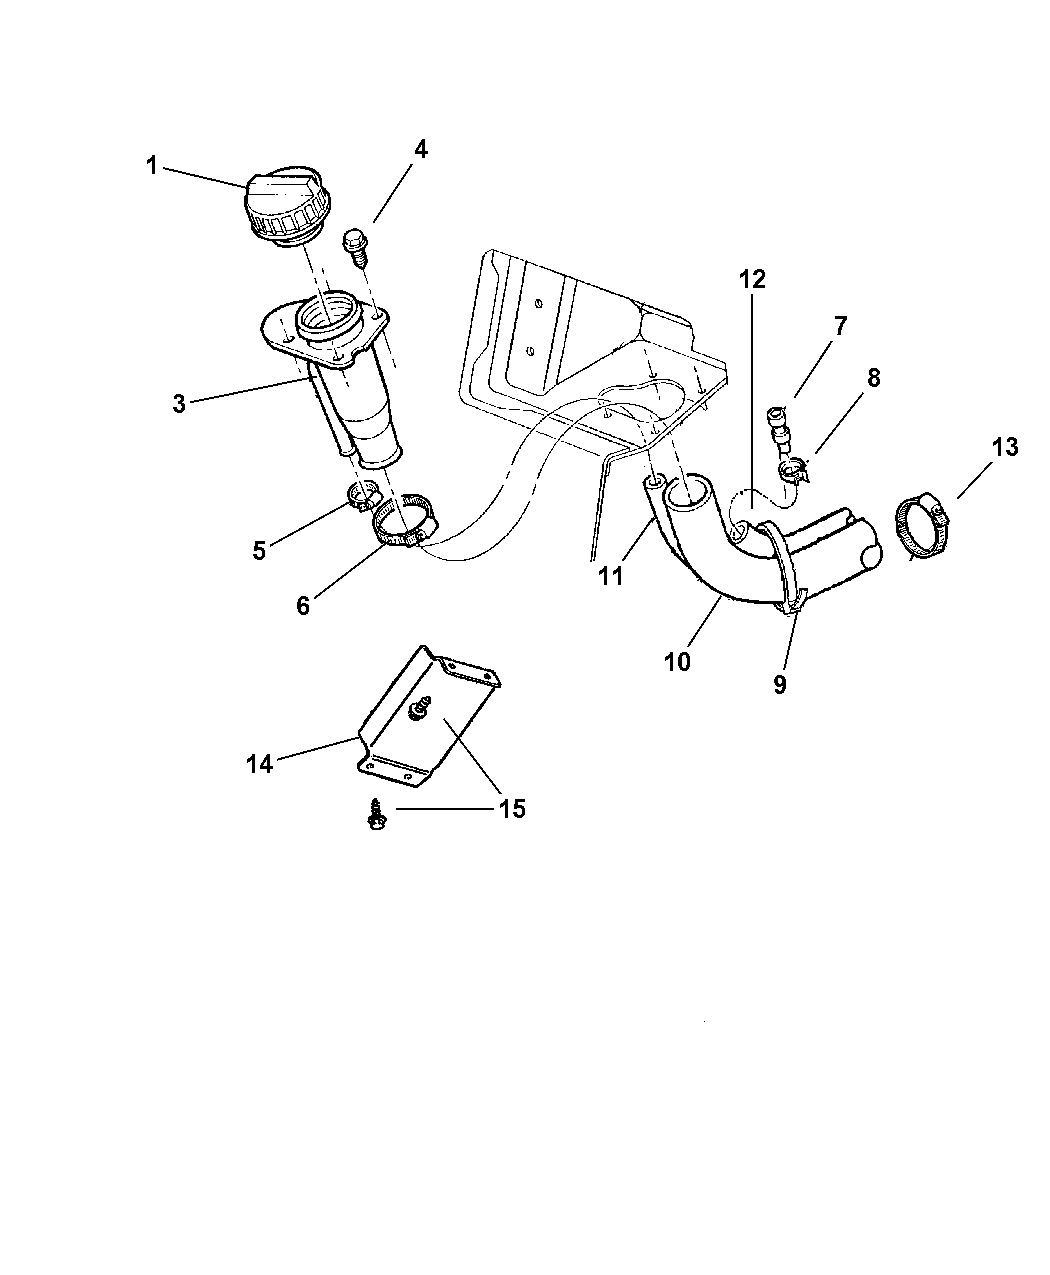 Jeep Cherokee Fuel Tank Filler Tube